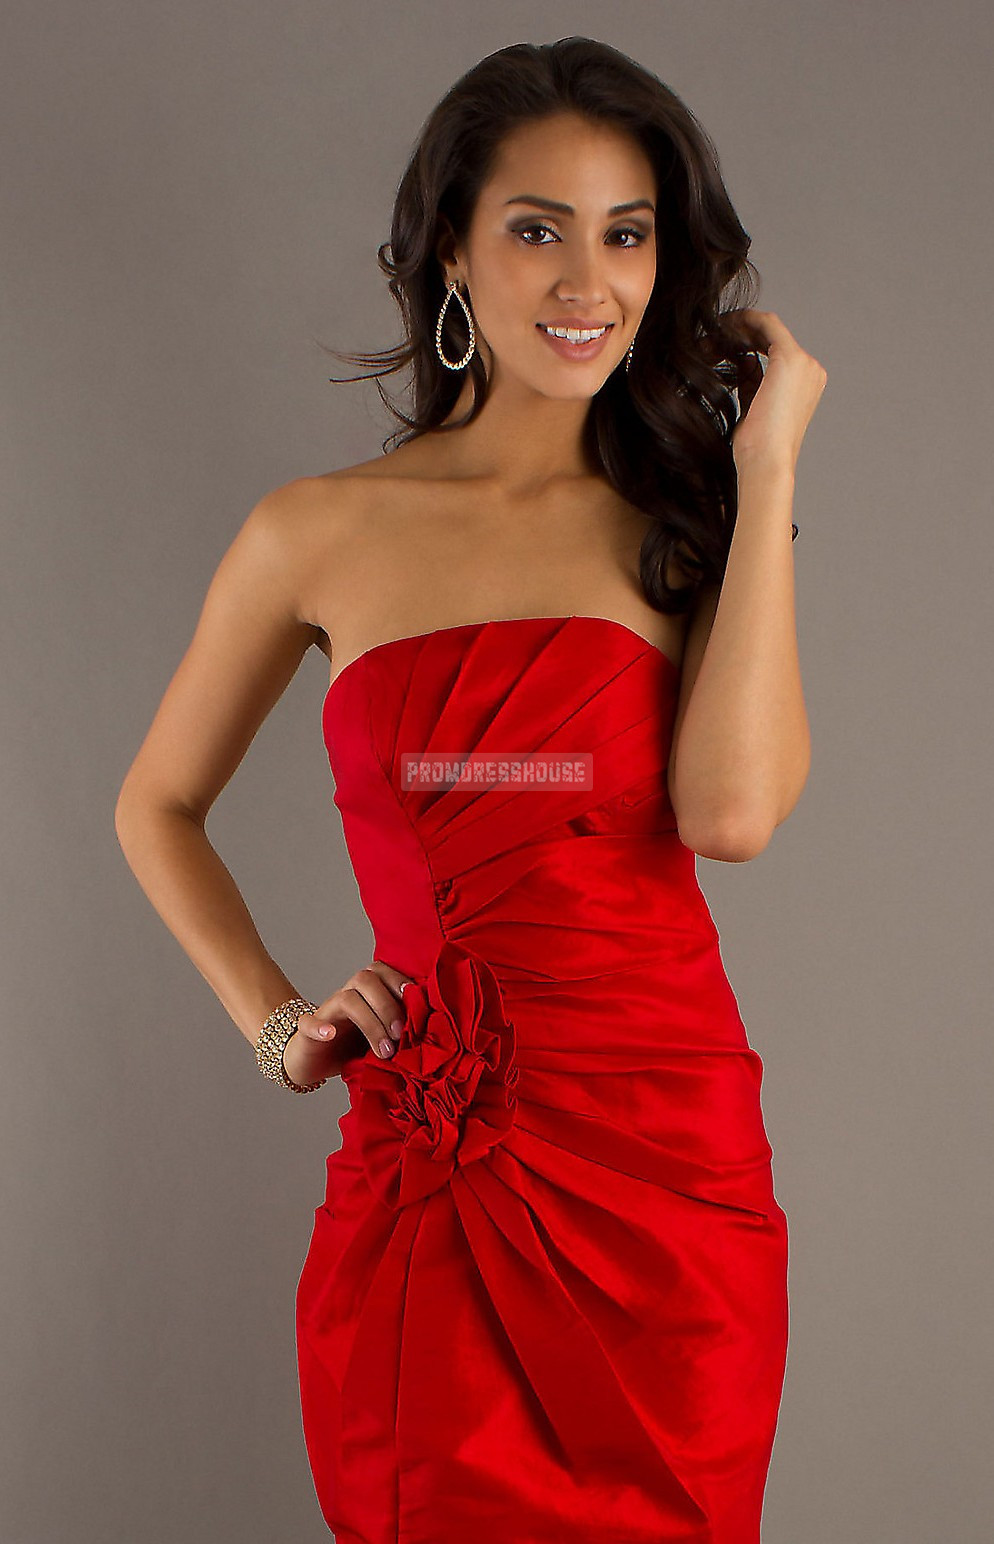 Red Strapless Short Length Sheath Taffeta Pleated Prom Dress - Promdresshouse.com